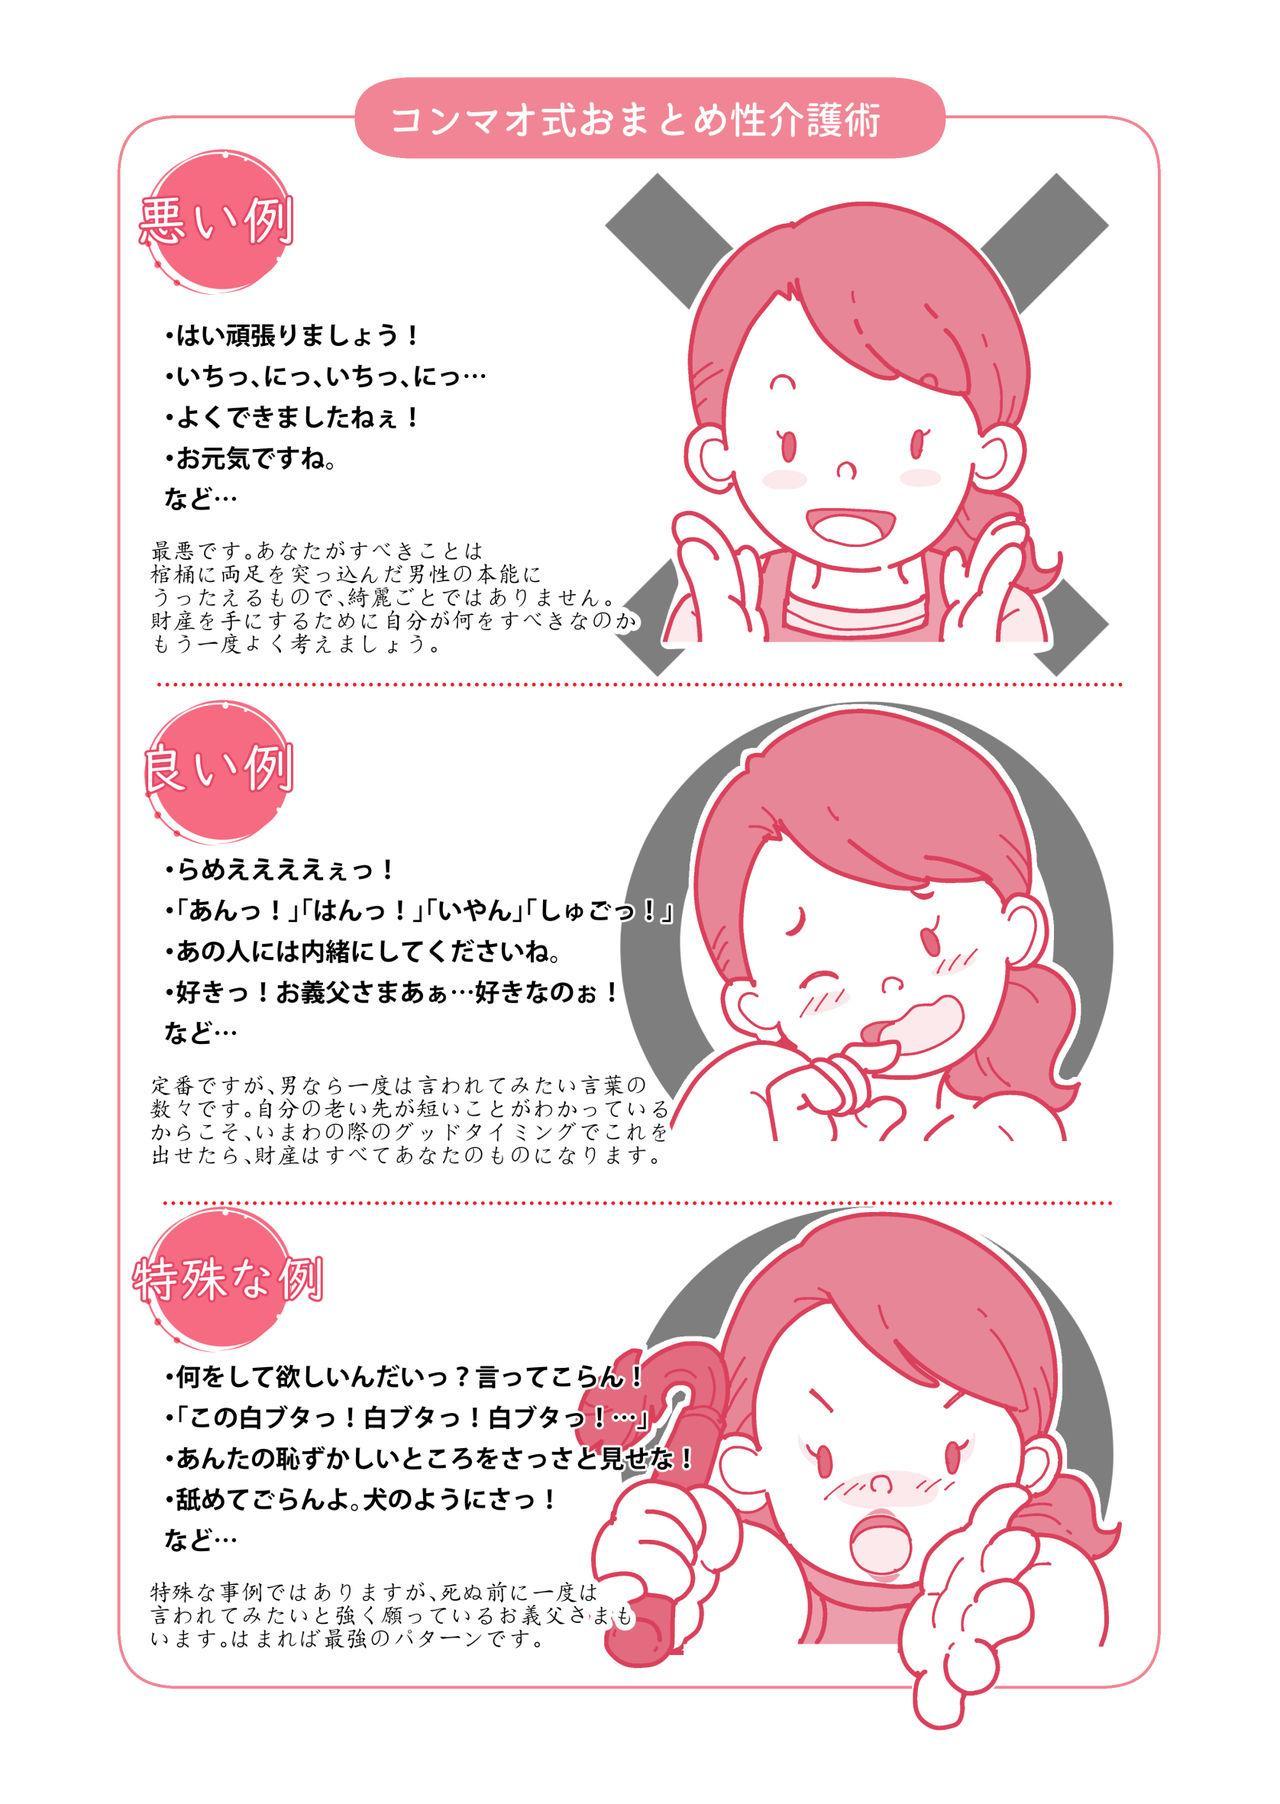 Isogasii Okaasan No Tamuno Sasa Rouzin Seikaigo | Guide for Elderly Sex Health Care to Busy Mom 14